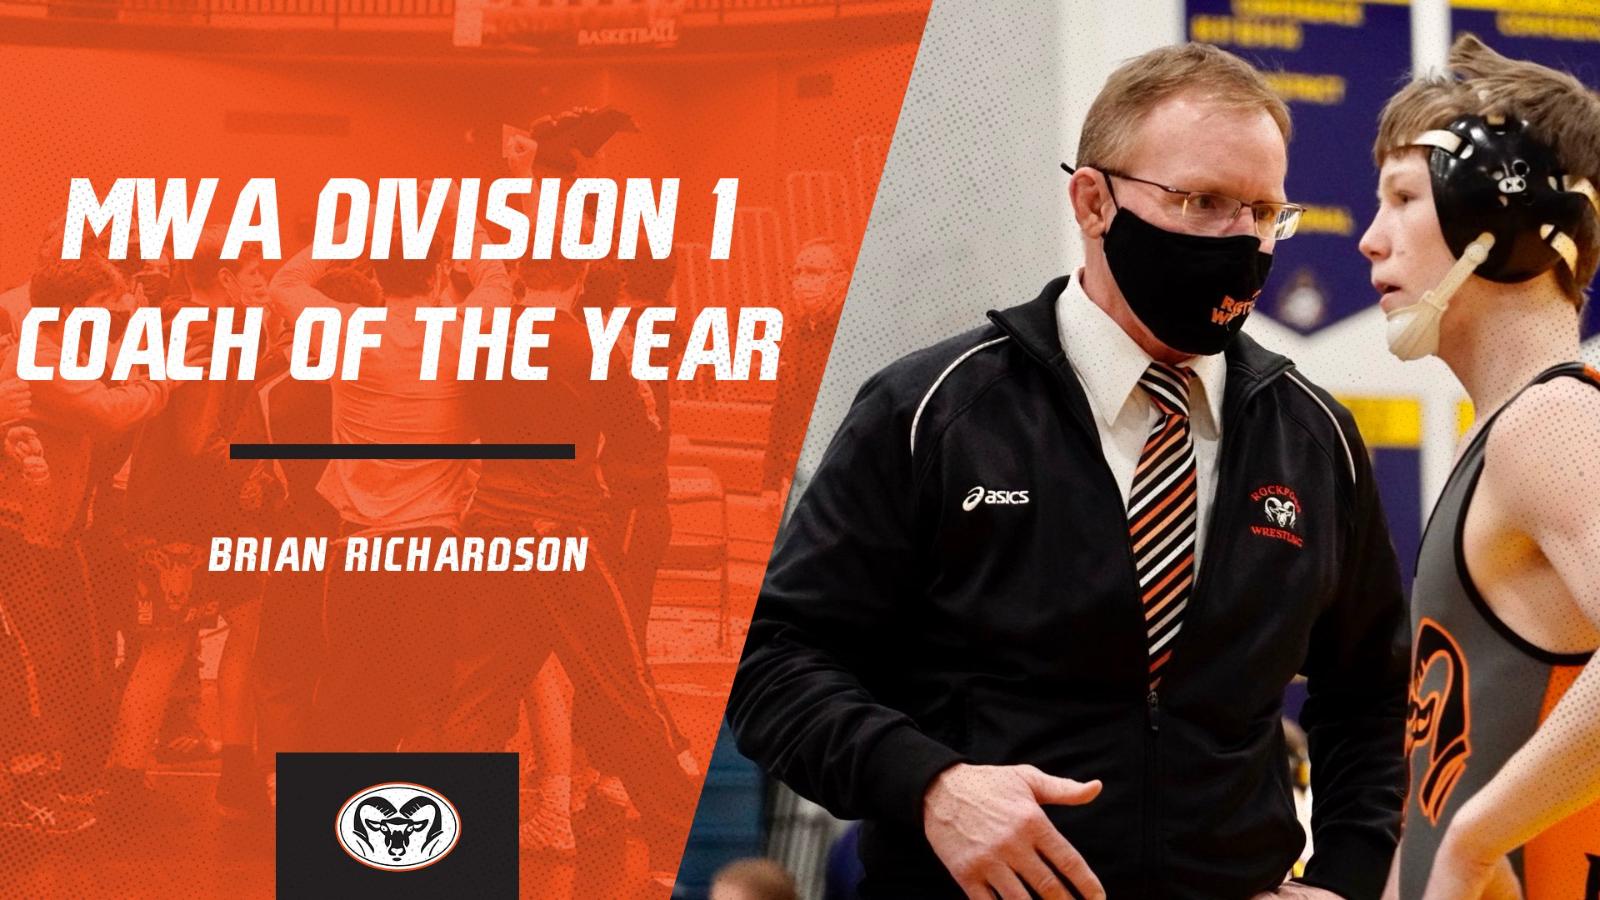 Coach Richardson wins MWA D1 Coach of the Year